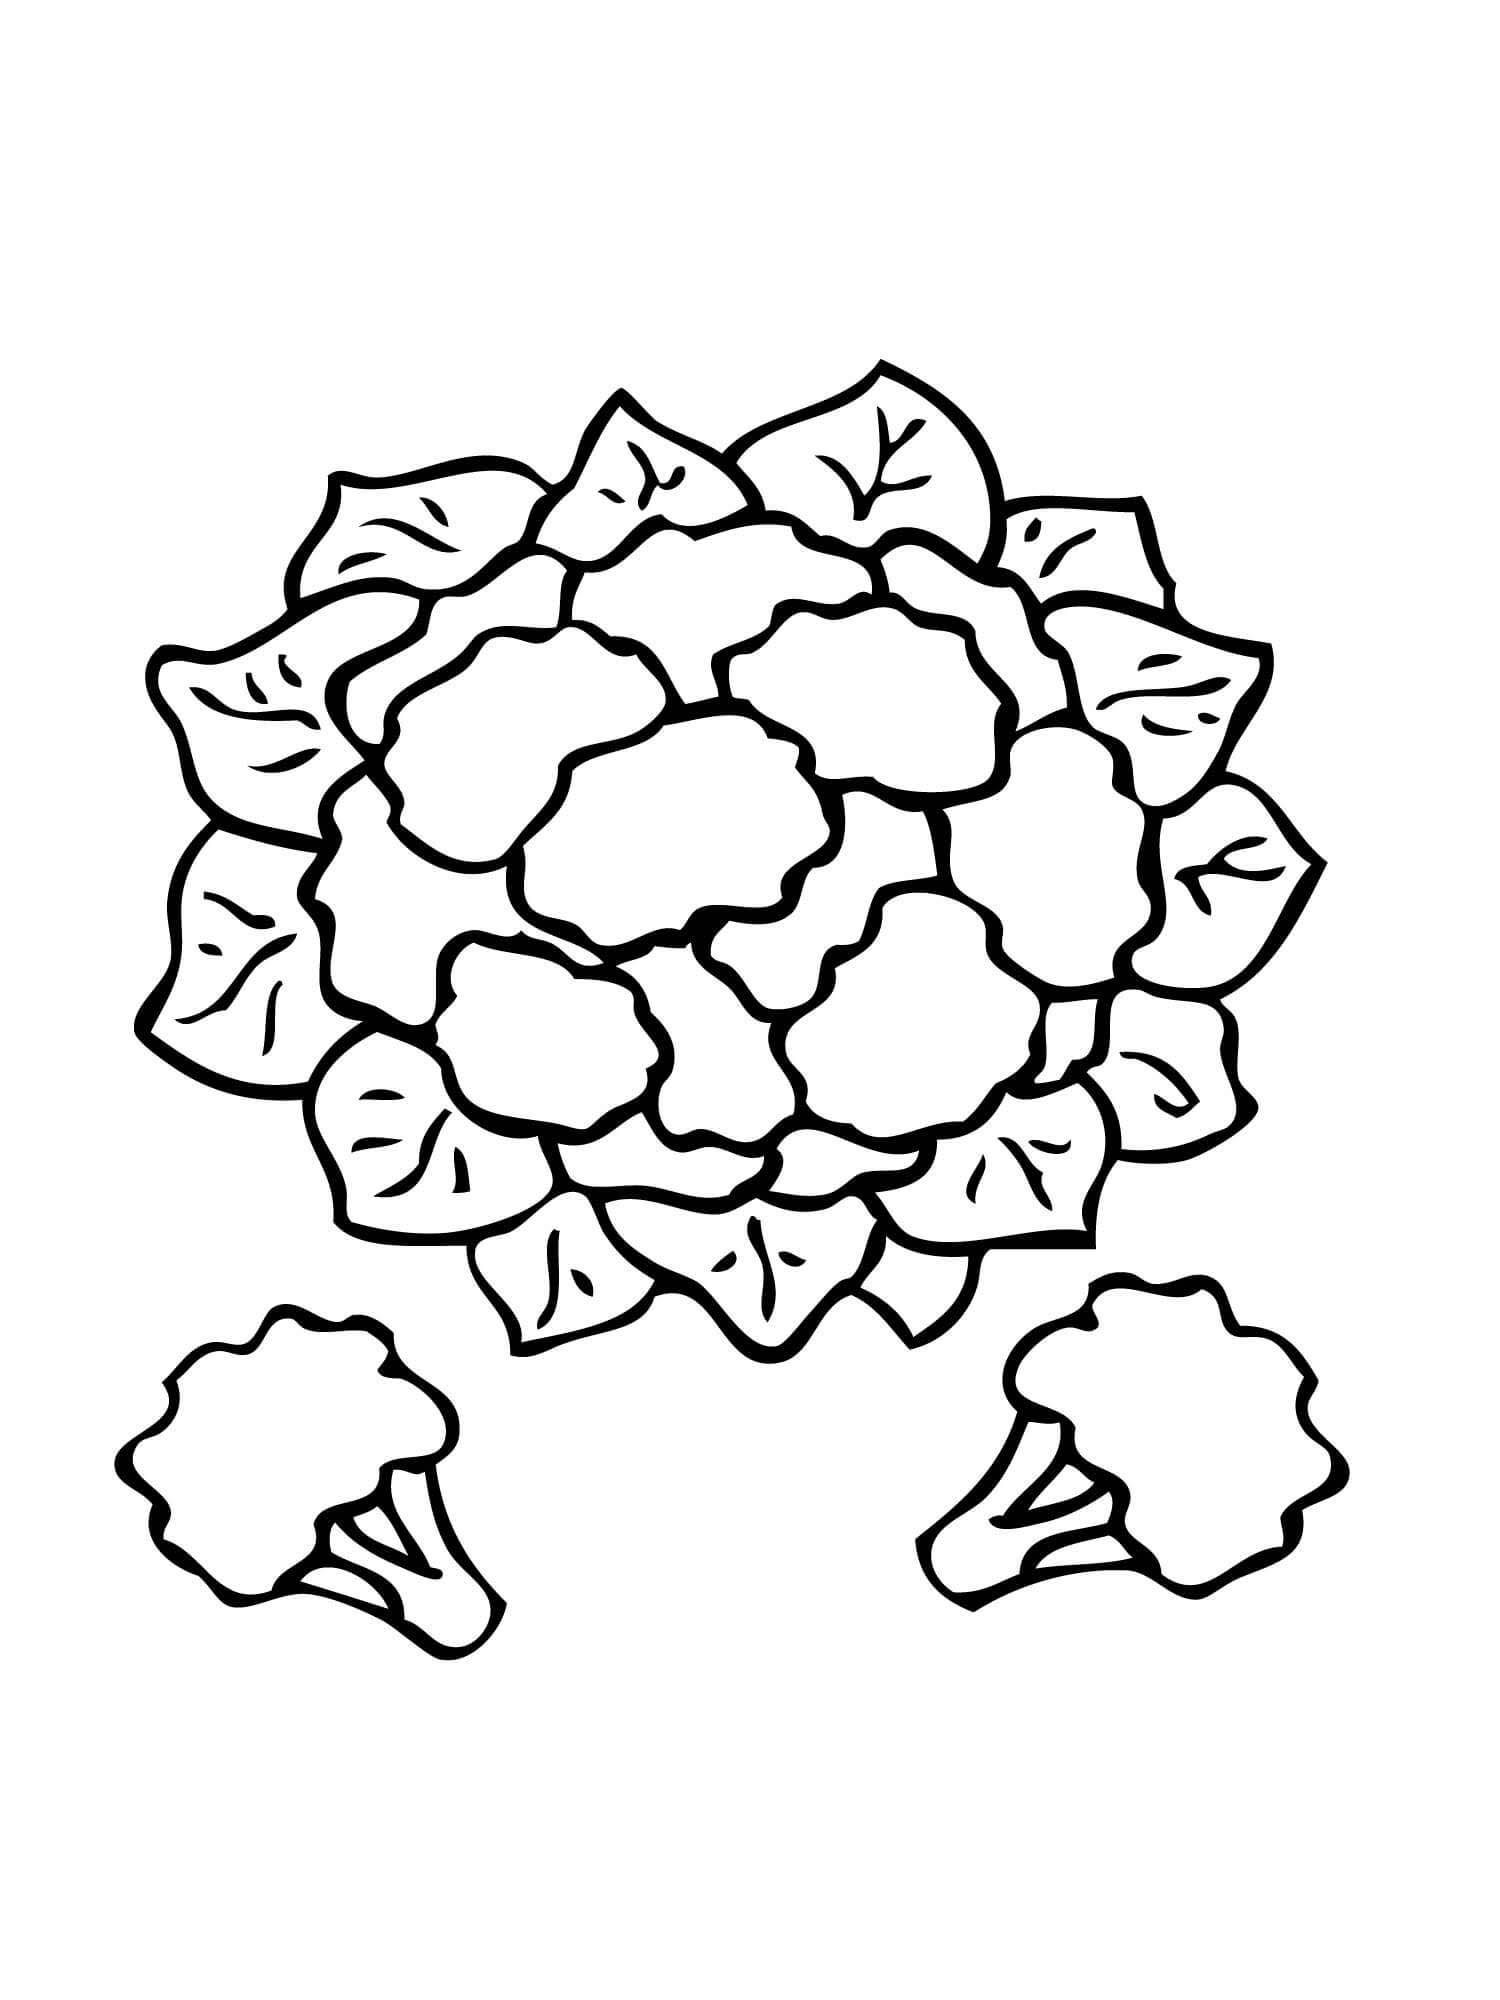 Desenho de Couve-flor para colorir - Tudodesenhos